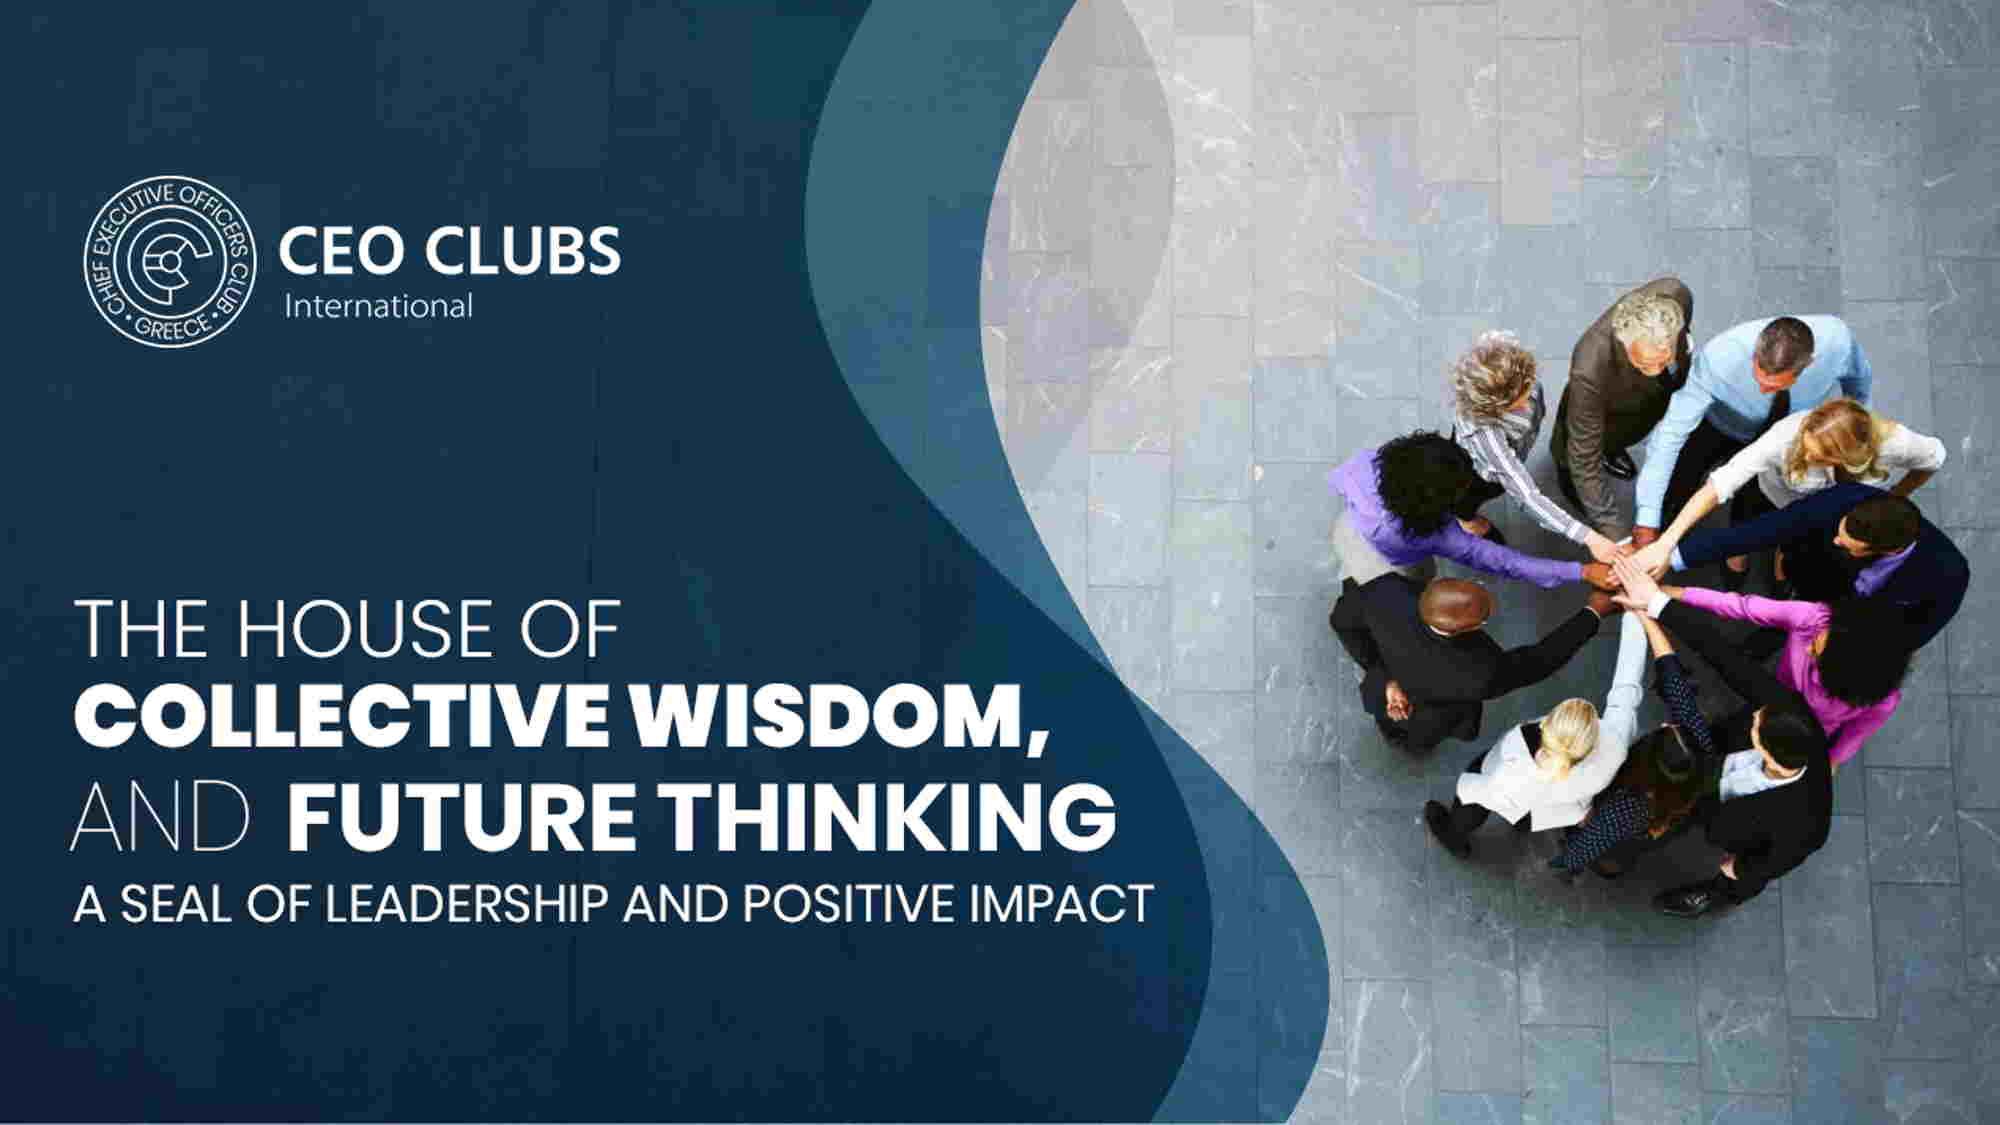 CEO Clubs Greece: Με Ανανεωμένη Στρατηγική για την Επόμενη Δεκαετία